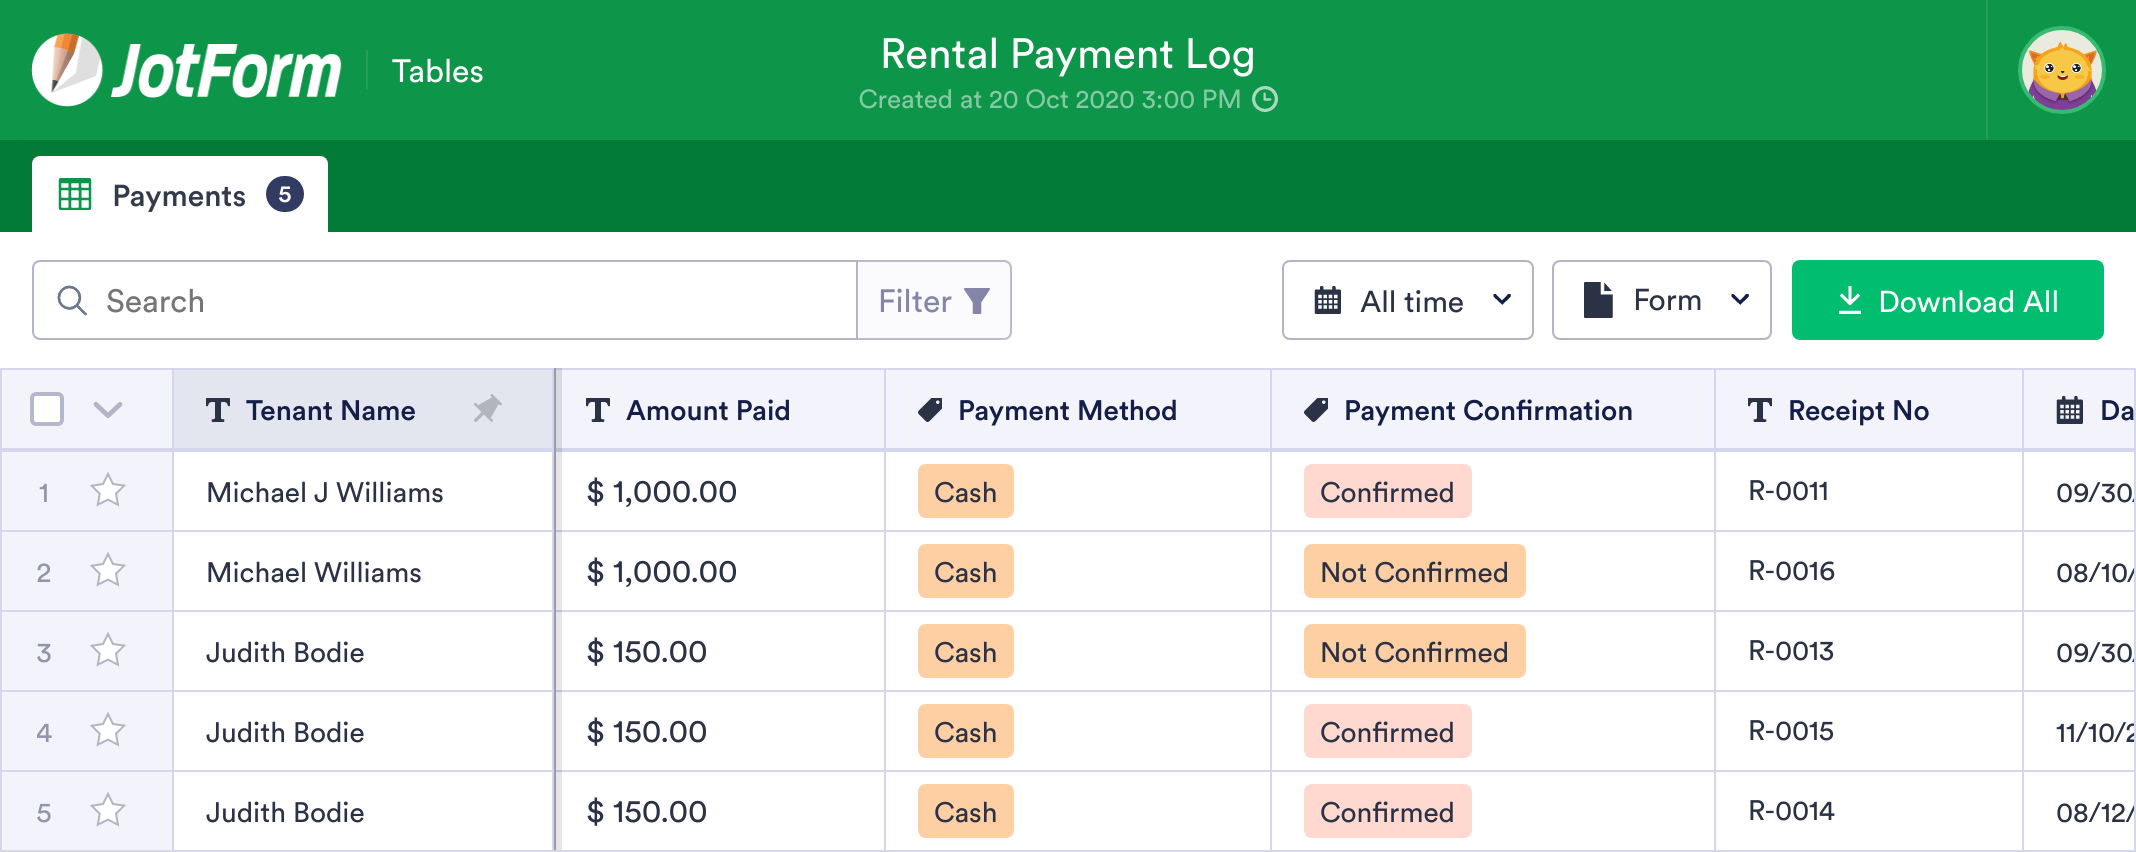 Rental Payment Log Template